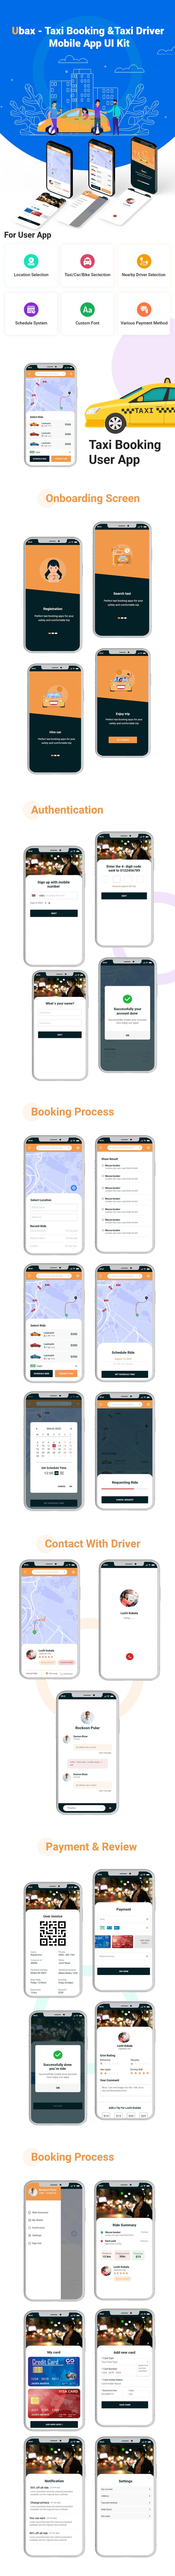 Ubax - Biggest Ride Sharing Flutter Full App UI Kit - 2